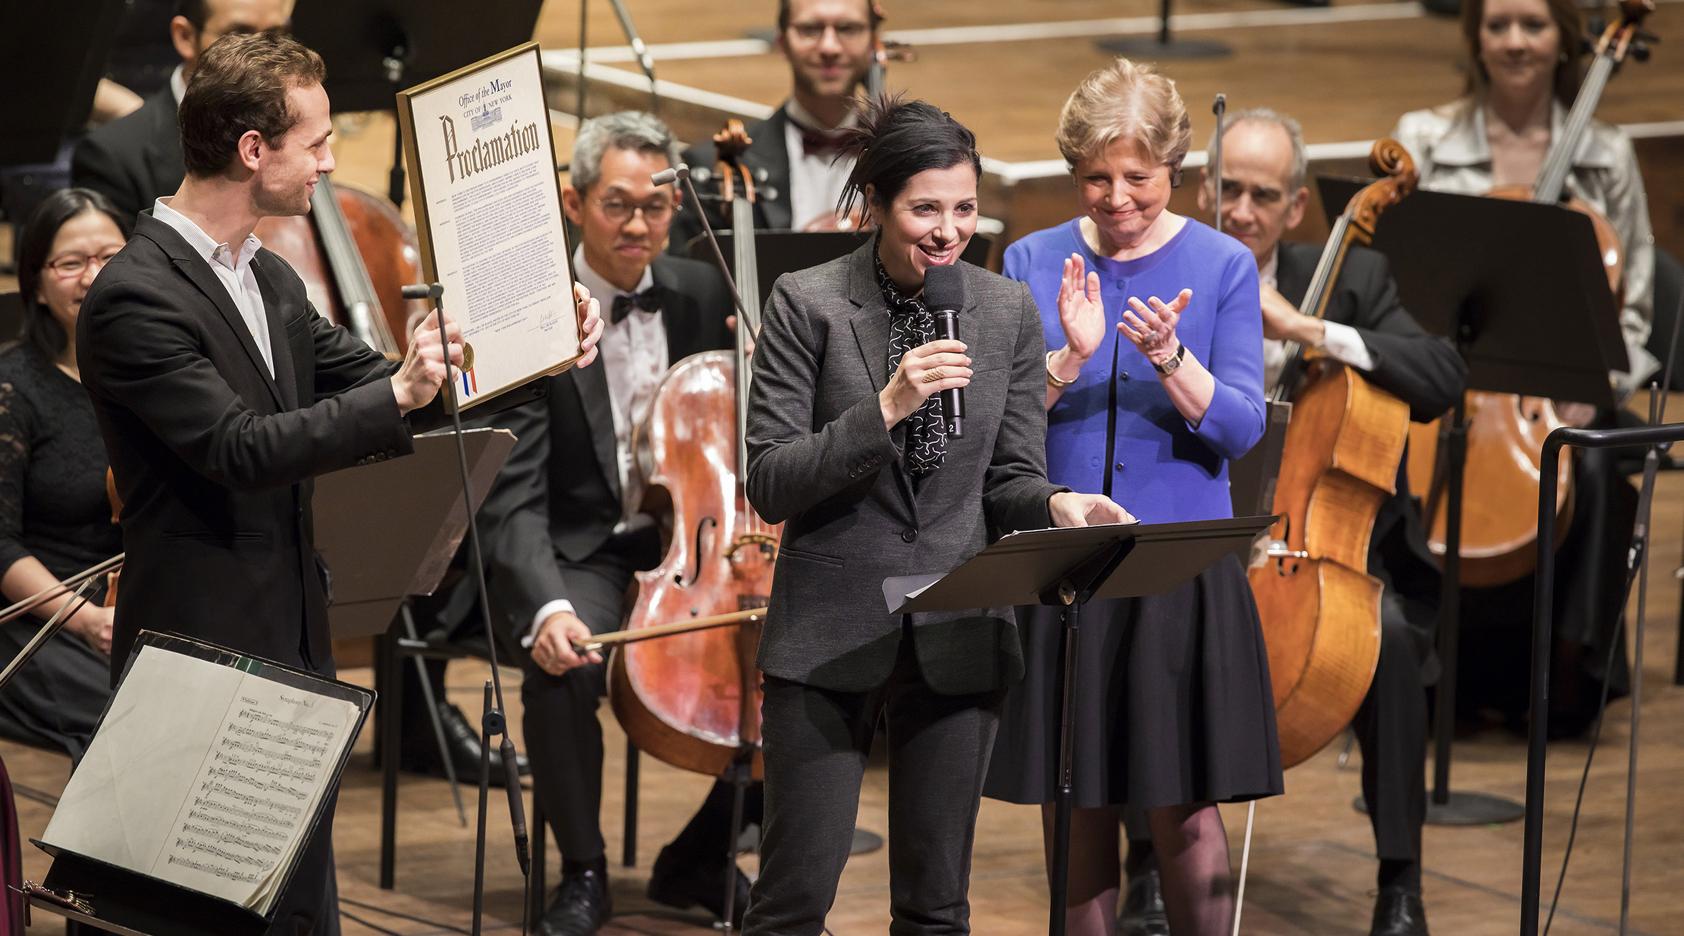 New York City Proclaims December 7 New York Philharmonic Day